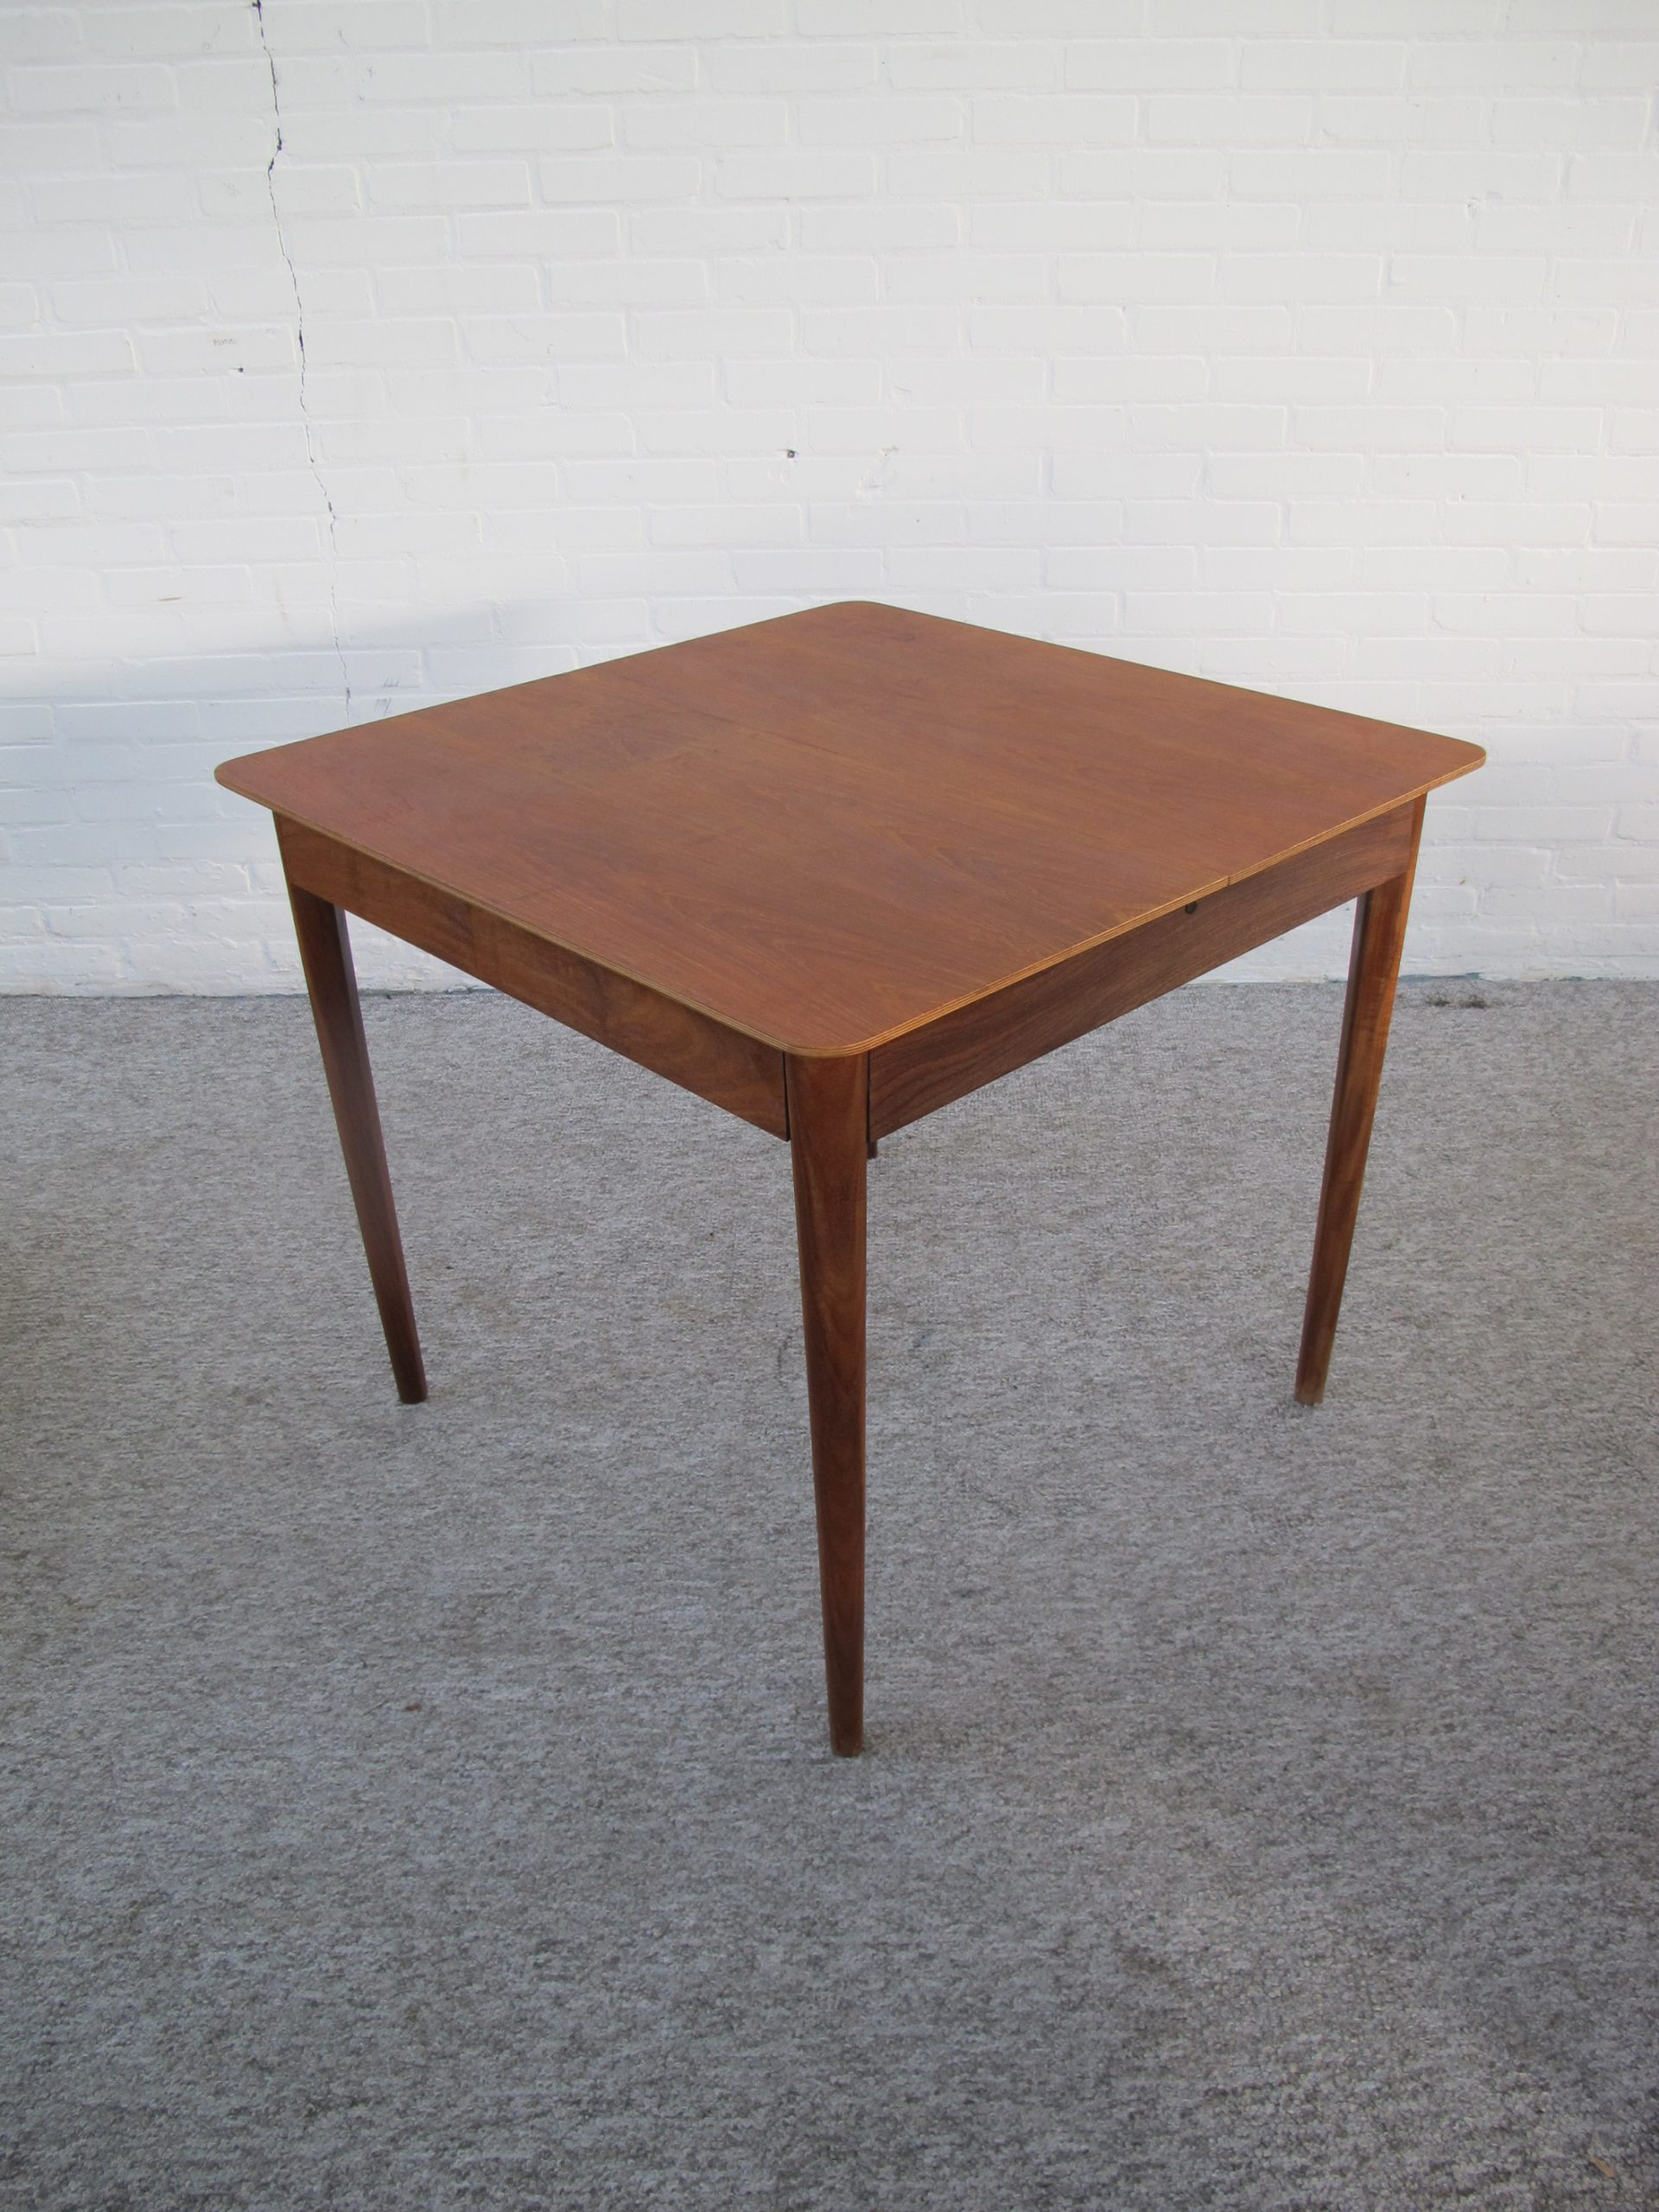 Table pastoe tafel teakhout dining table vintage midcentury